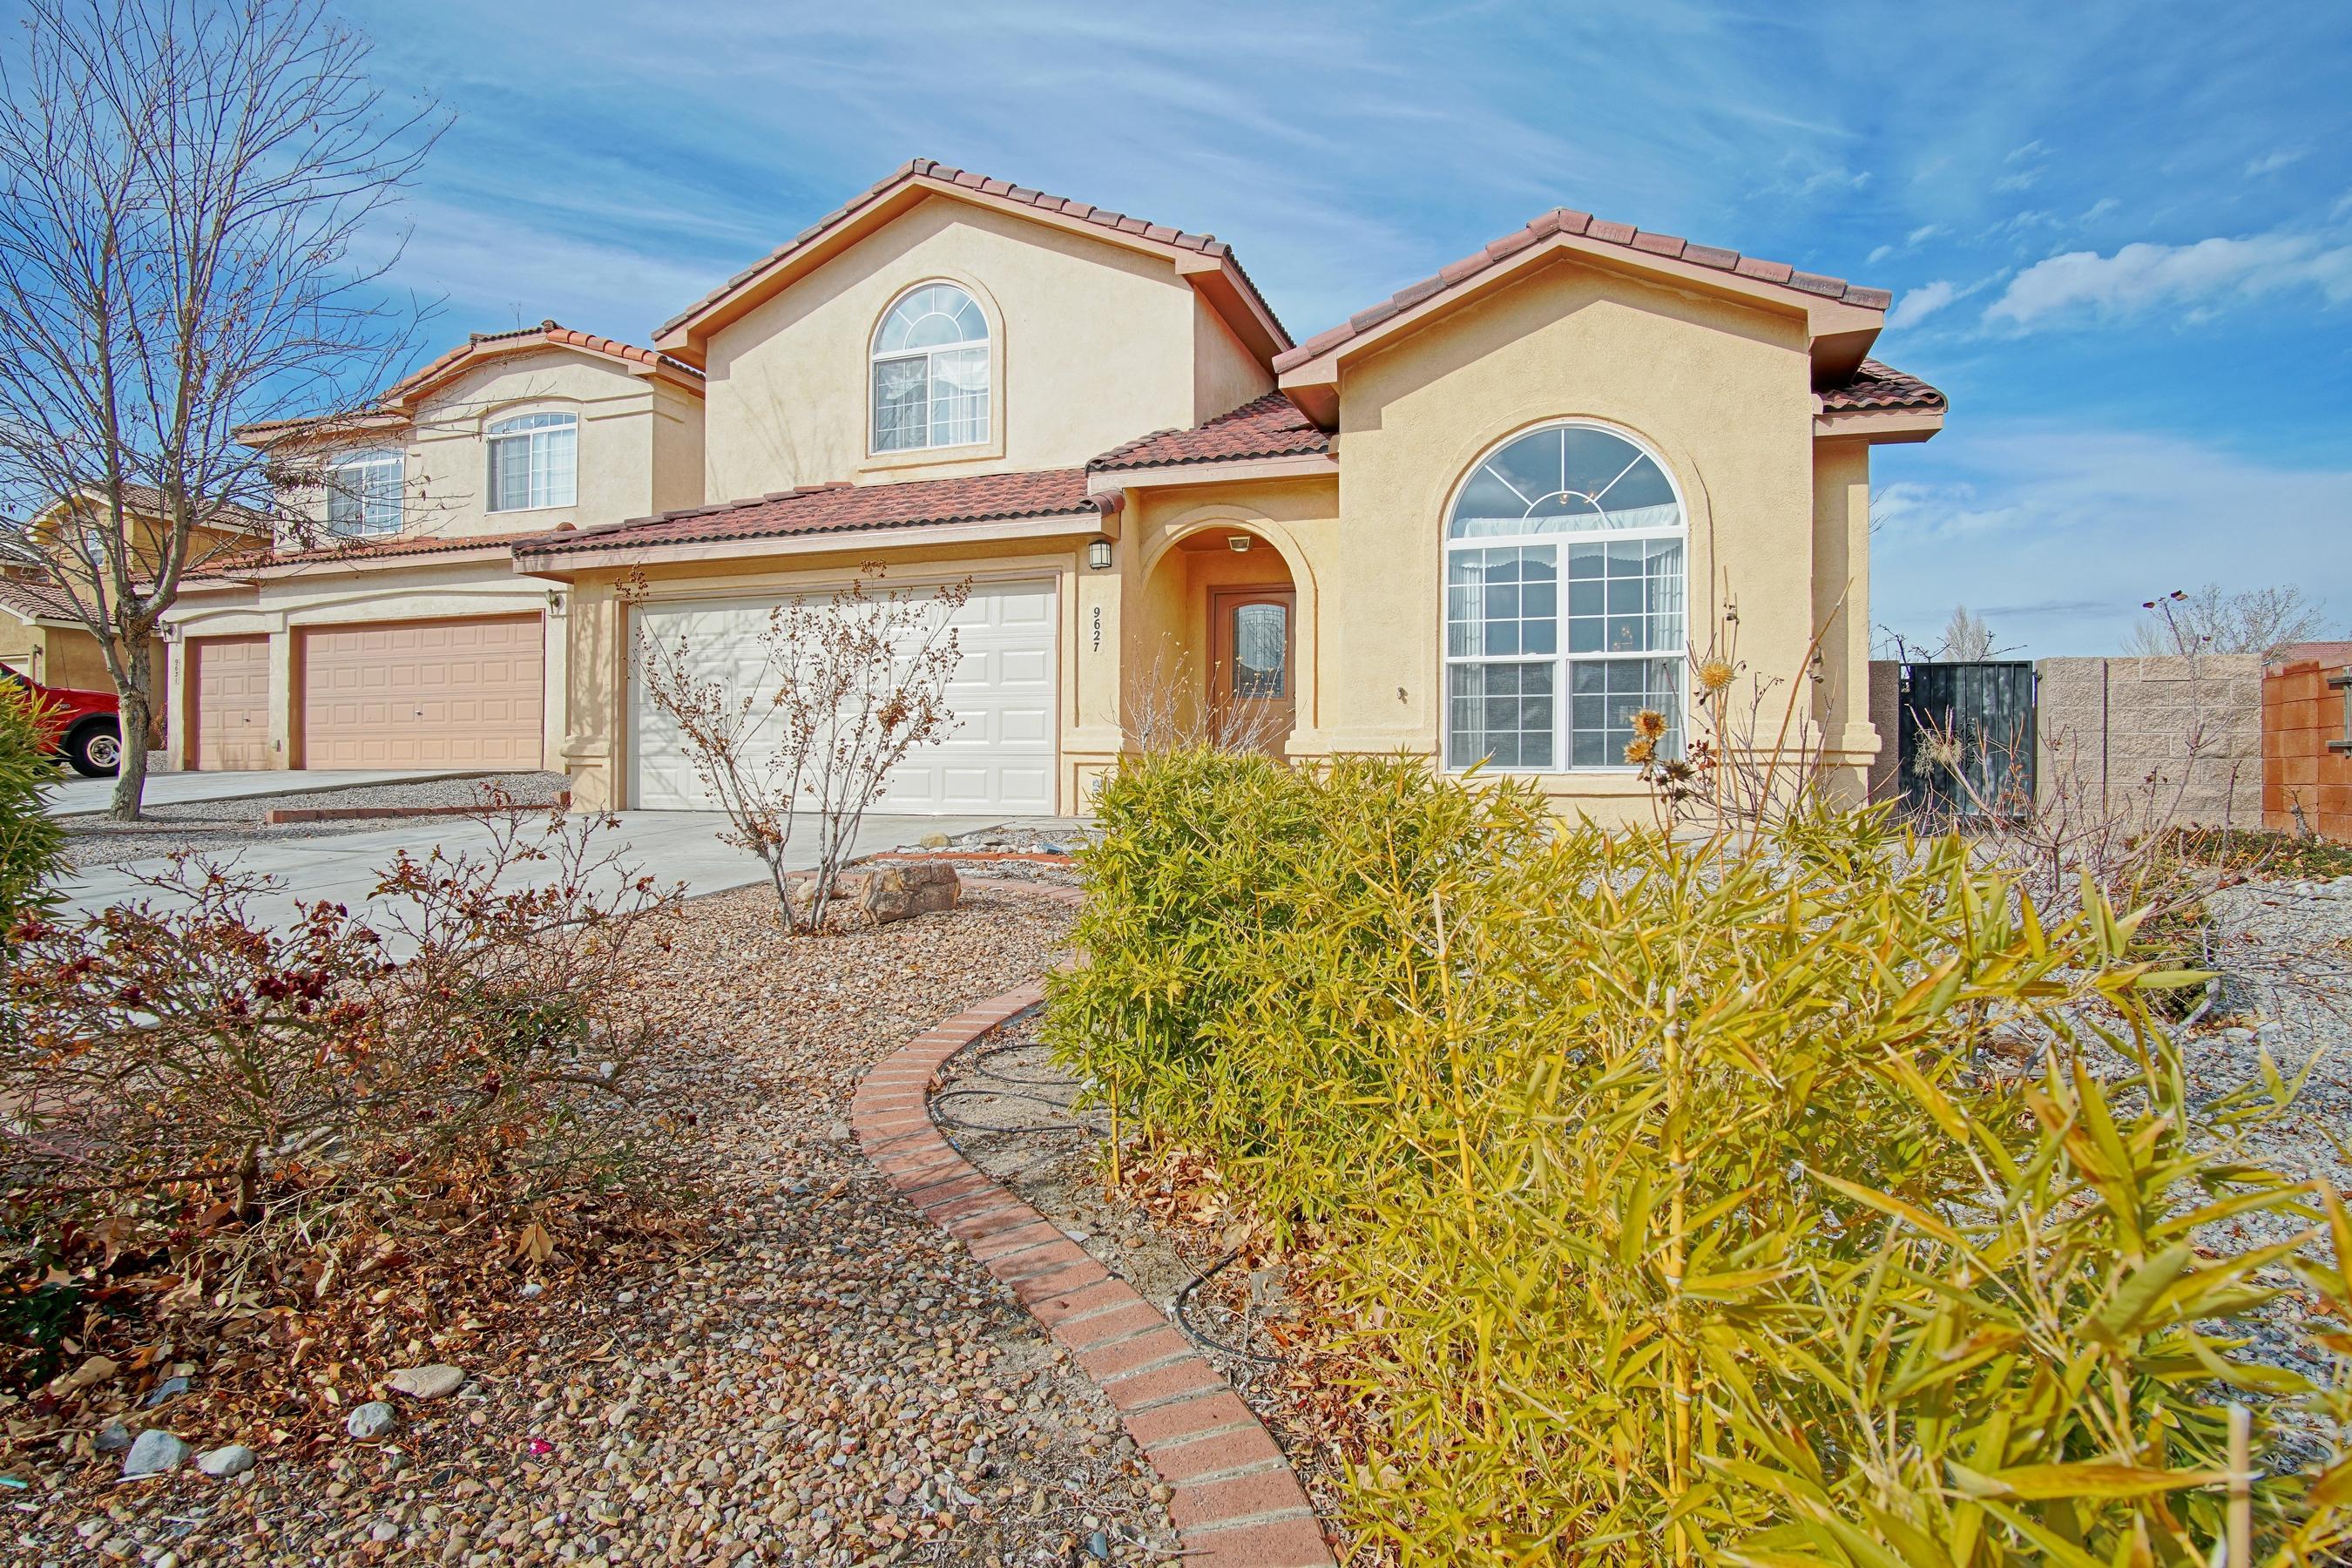 9627 NW Kilauea Avenue, Northwest Albuquerque and Northwest Heights, New Mexico